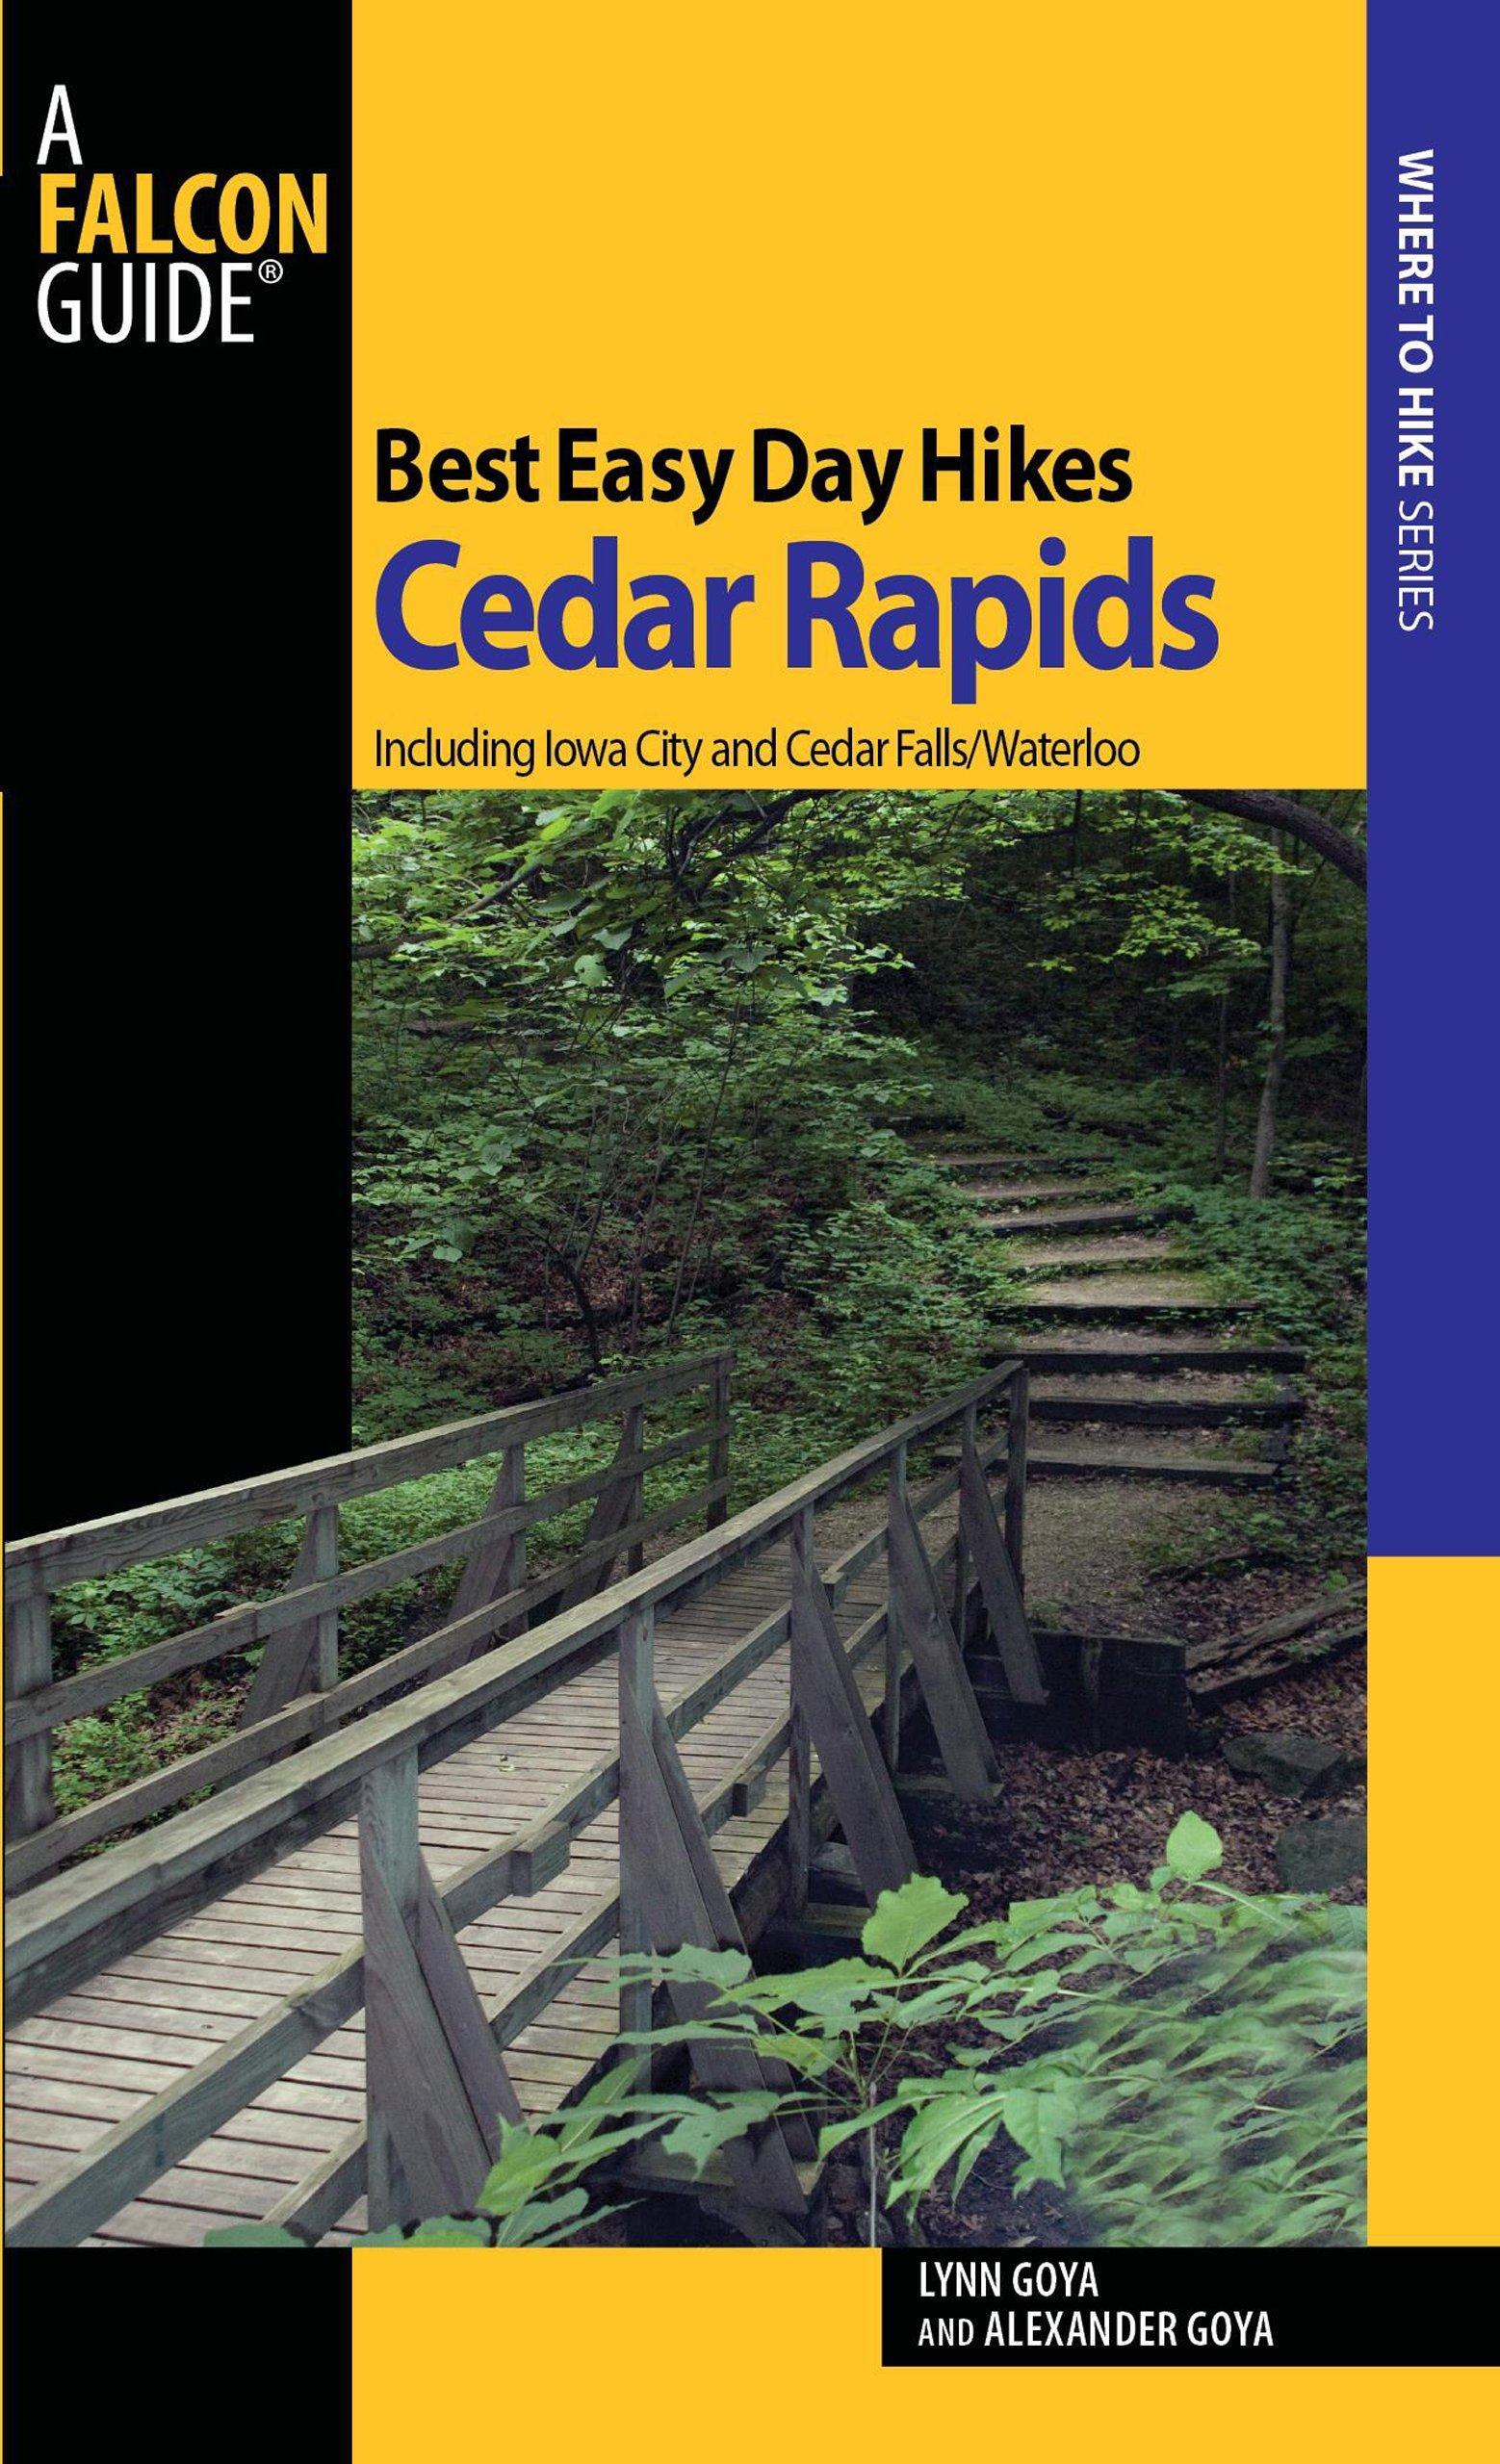 Read Online Best Easy Day Hikes Cedar Rapids: Including Iowa City And Cedar Falls/Waterloo (Best Easy Day Hikes Series) ebook